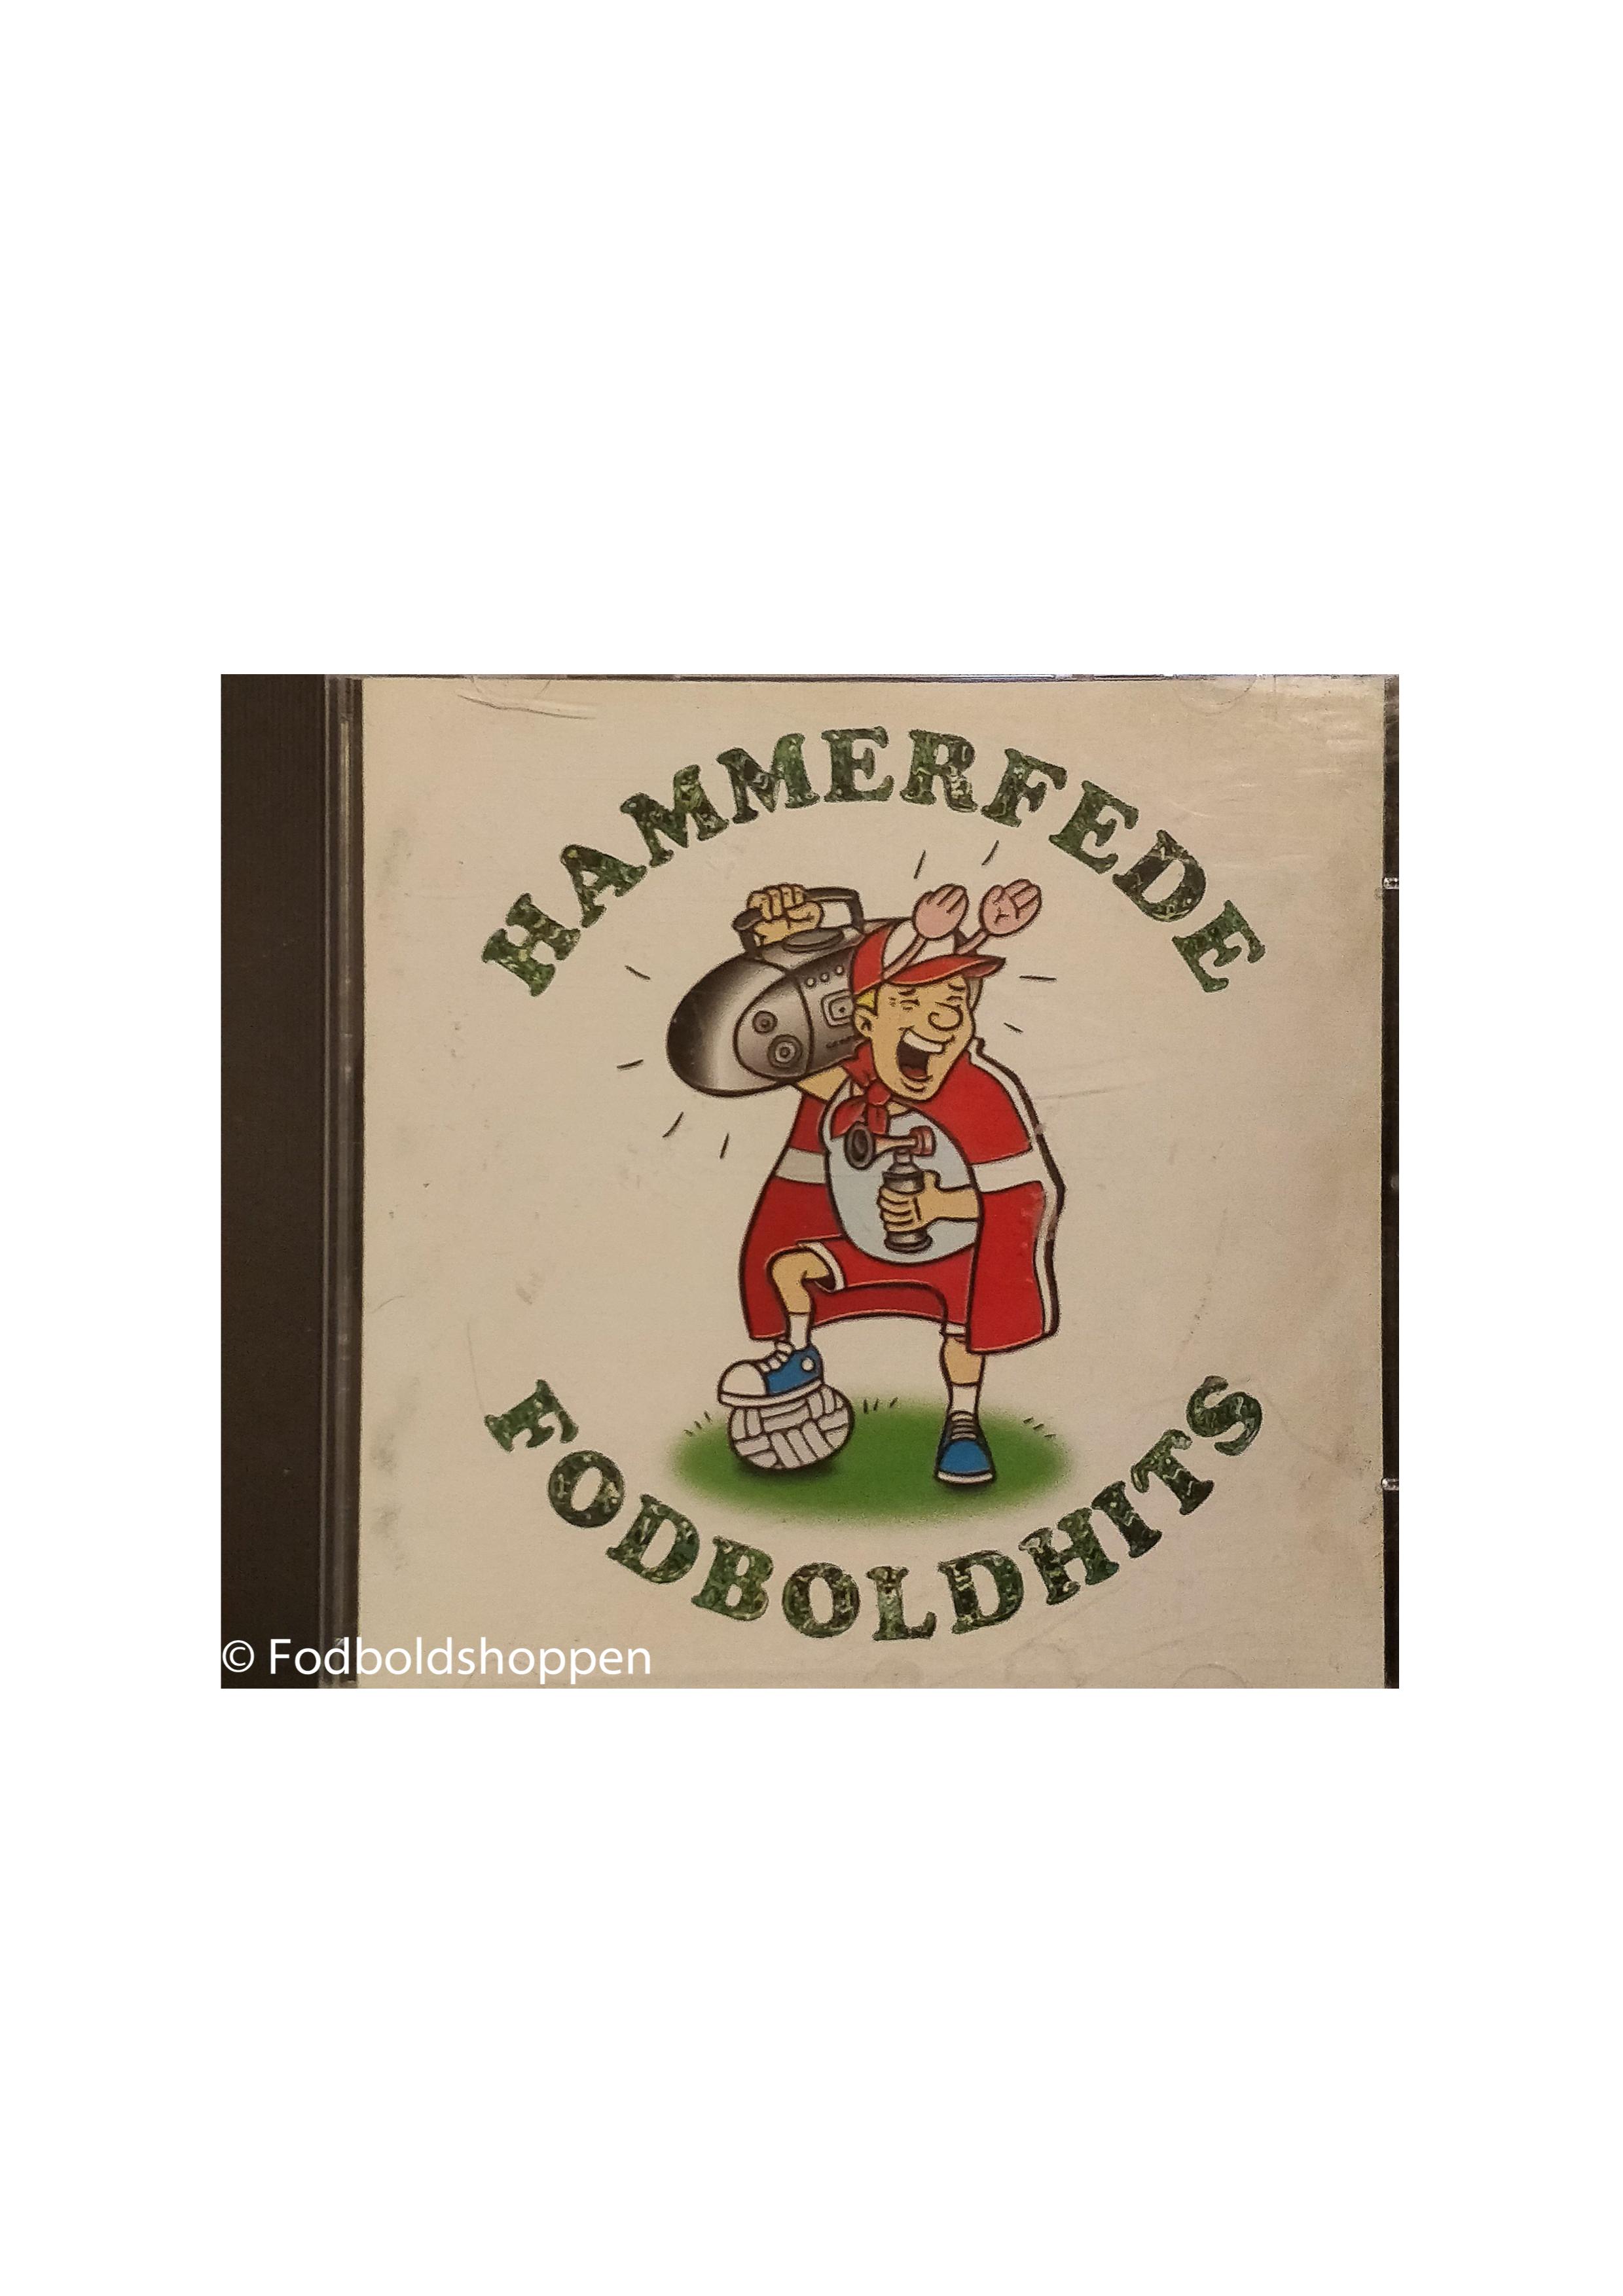 Hammerfede Fodboldhits CD